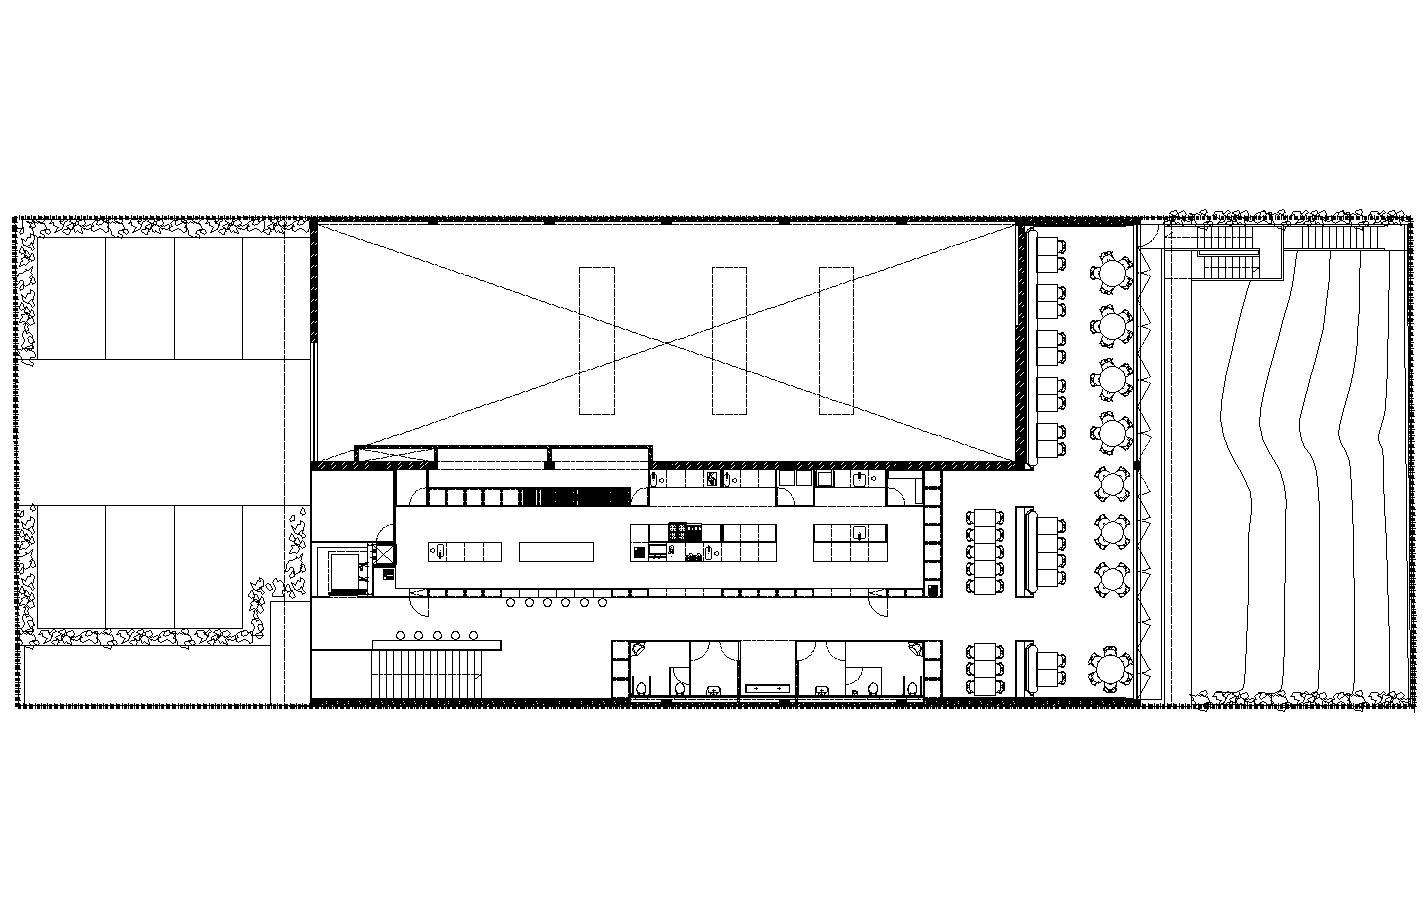 StudioCAN_Licenciamento_Restaurante_Brito_Rev02-Model